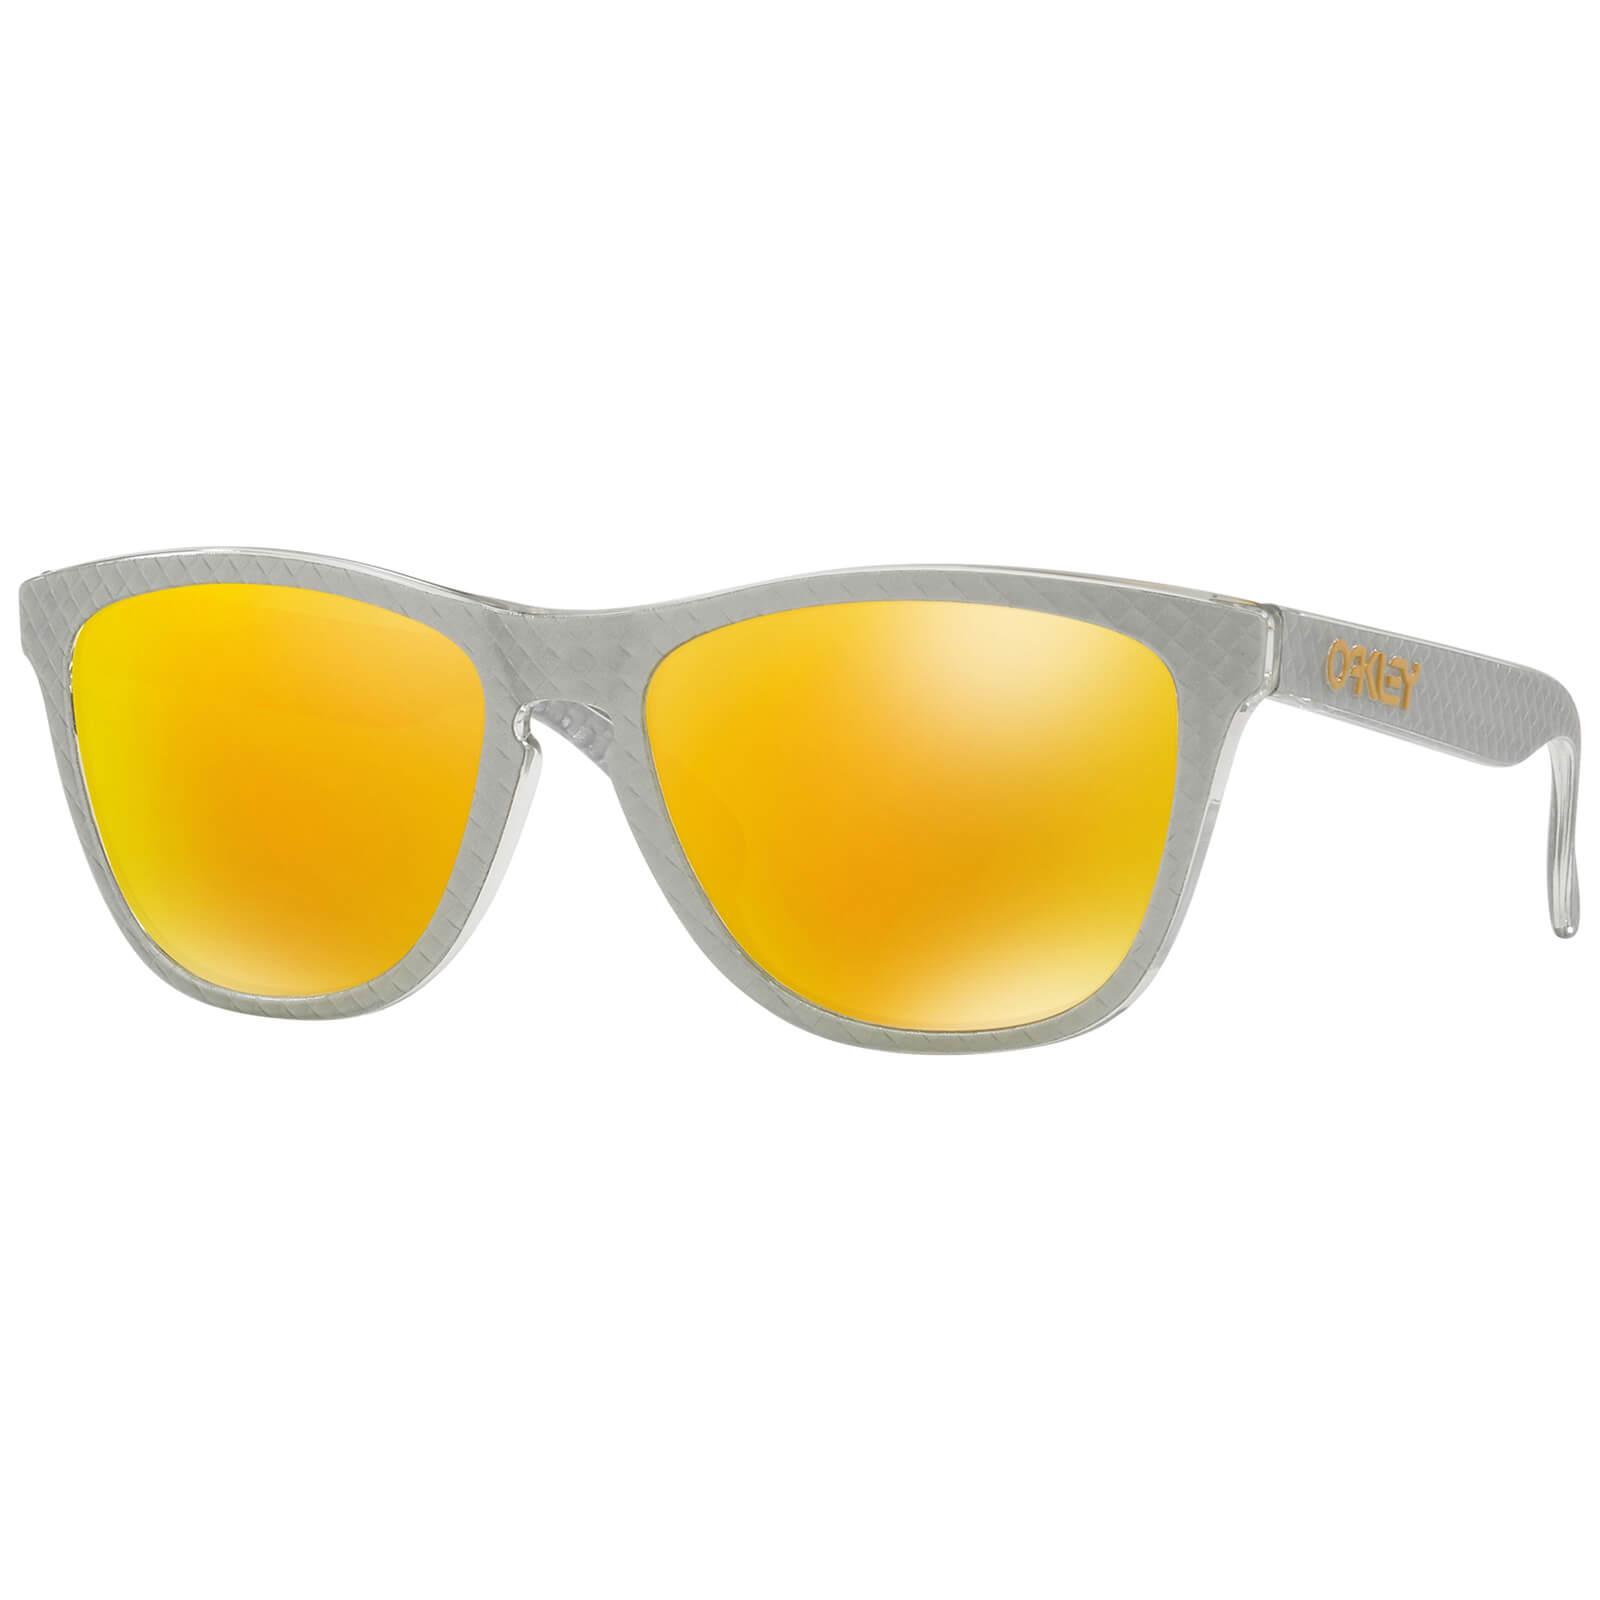 ee7405b233 Oakley Frogskins Limited Edition Sunglasses - Checkbox Silver Fire Iridium